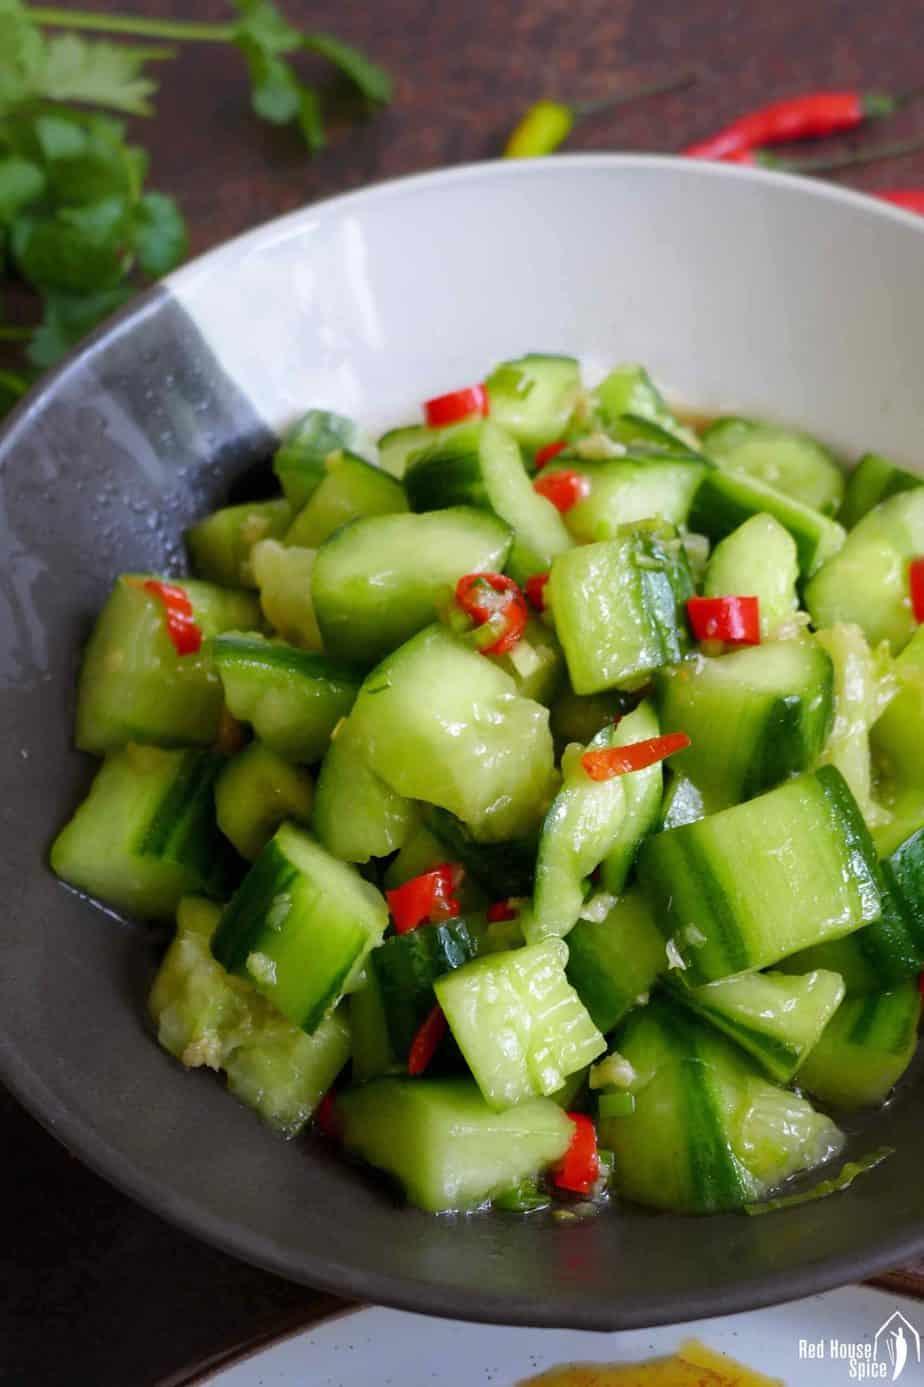 Chinese smashed cucumber salad with garlic dressing